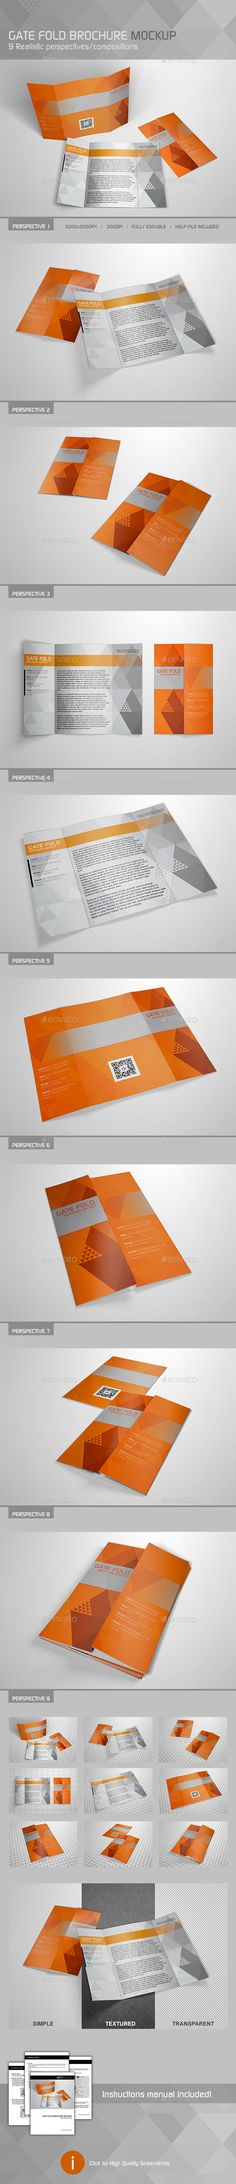 A4 Gatefold Brochure Mockup by idesignstudionet Graphic Design - gate fold brochure mockup